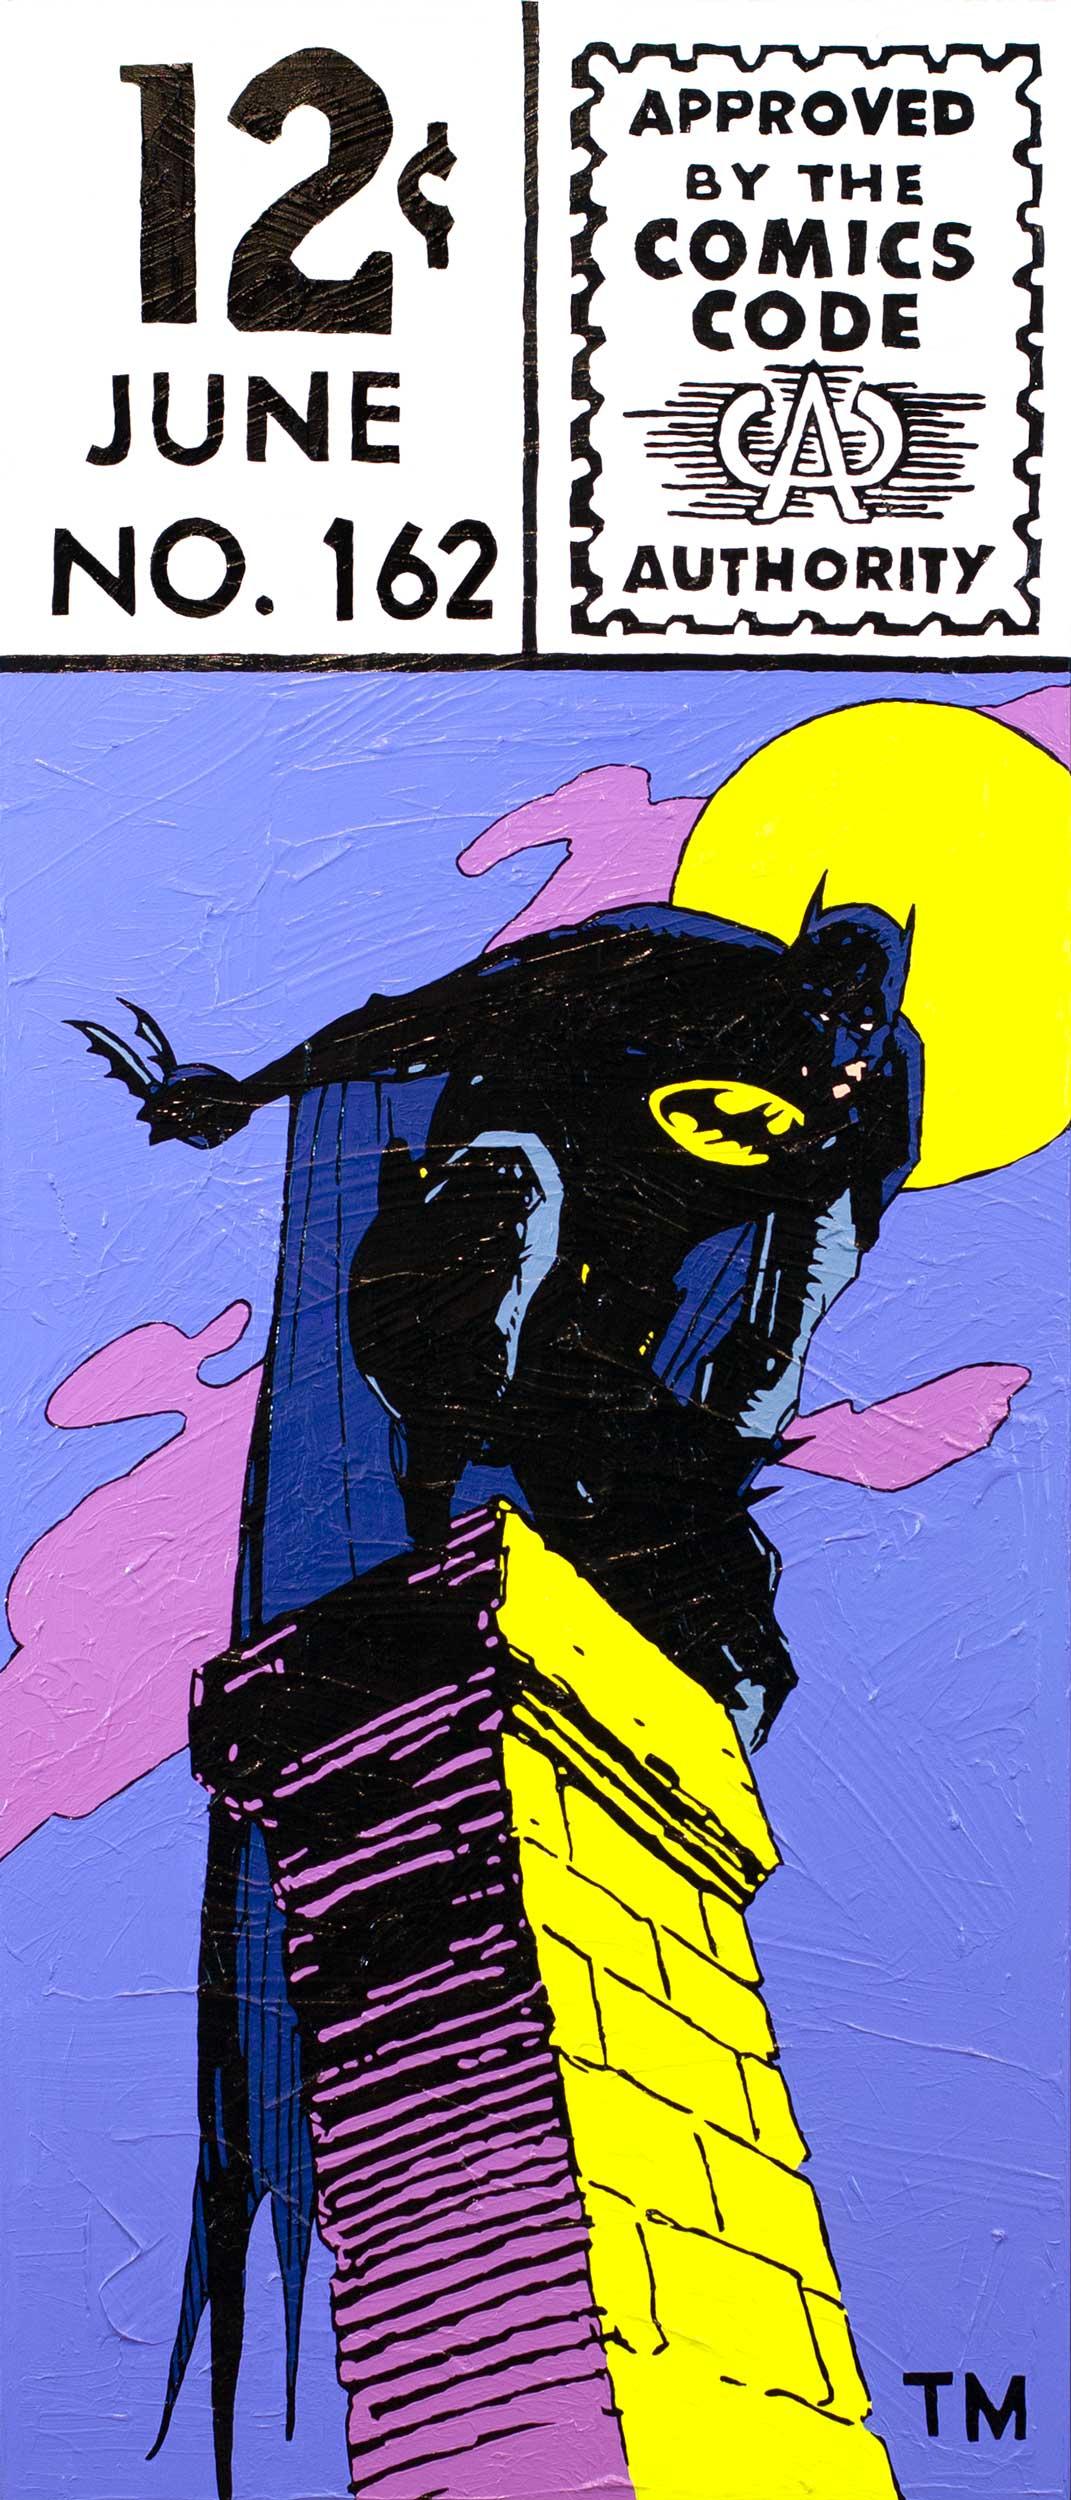 Gotham knight 16x36 toddmonk 2020 lo qjeyvn